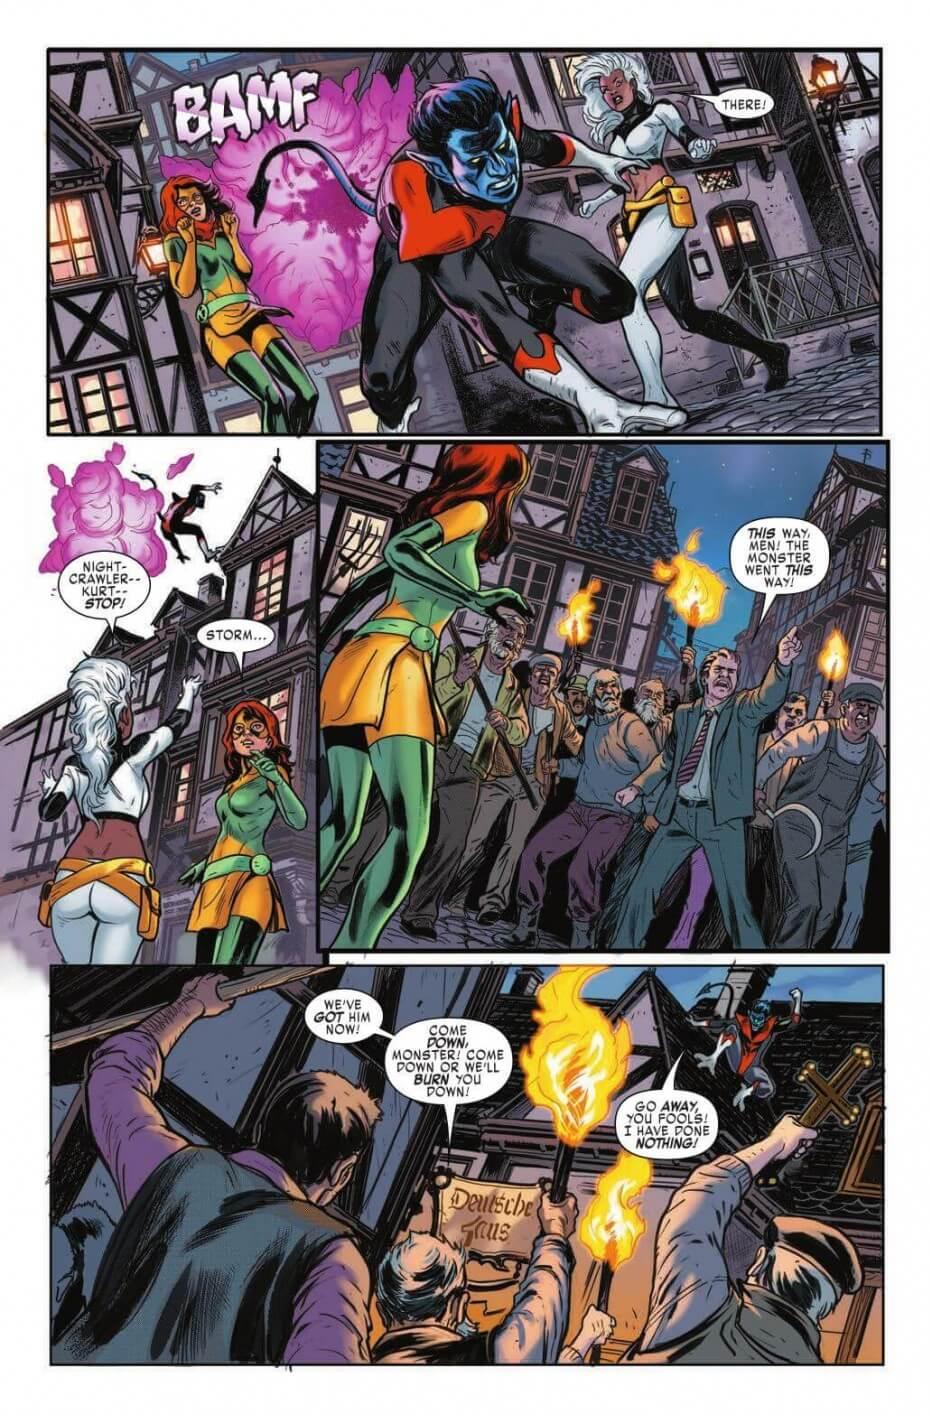 Extraordinary X-Men #7 with Nightcrawler, Jean Grey, and Storm